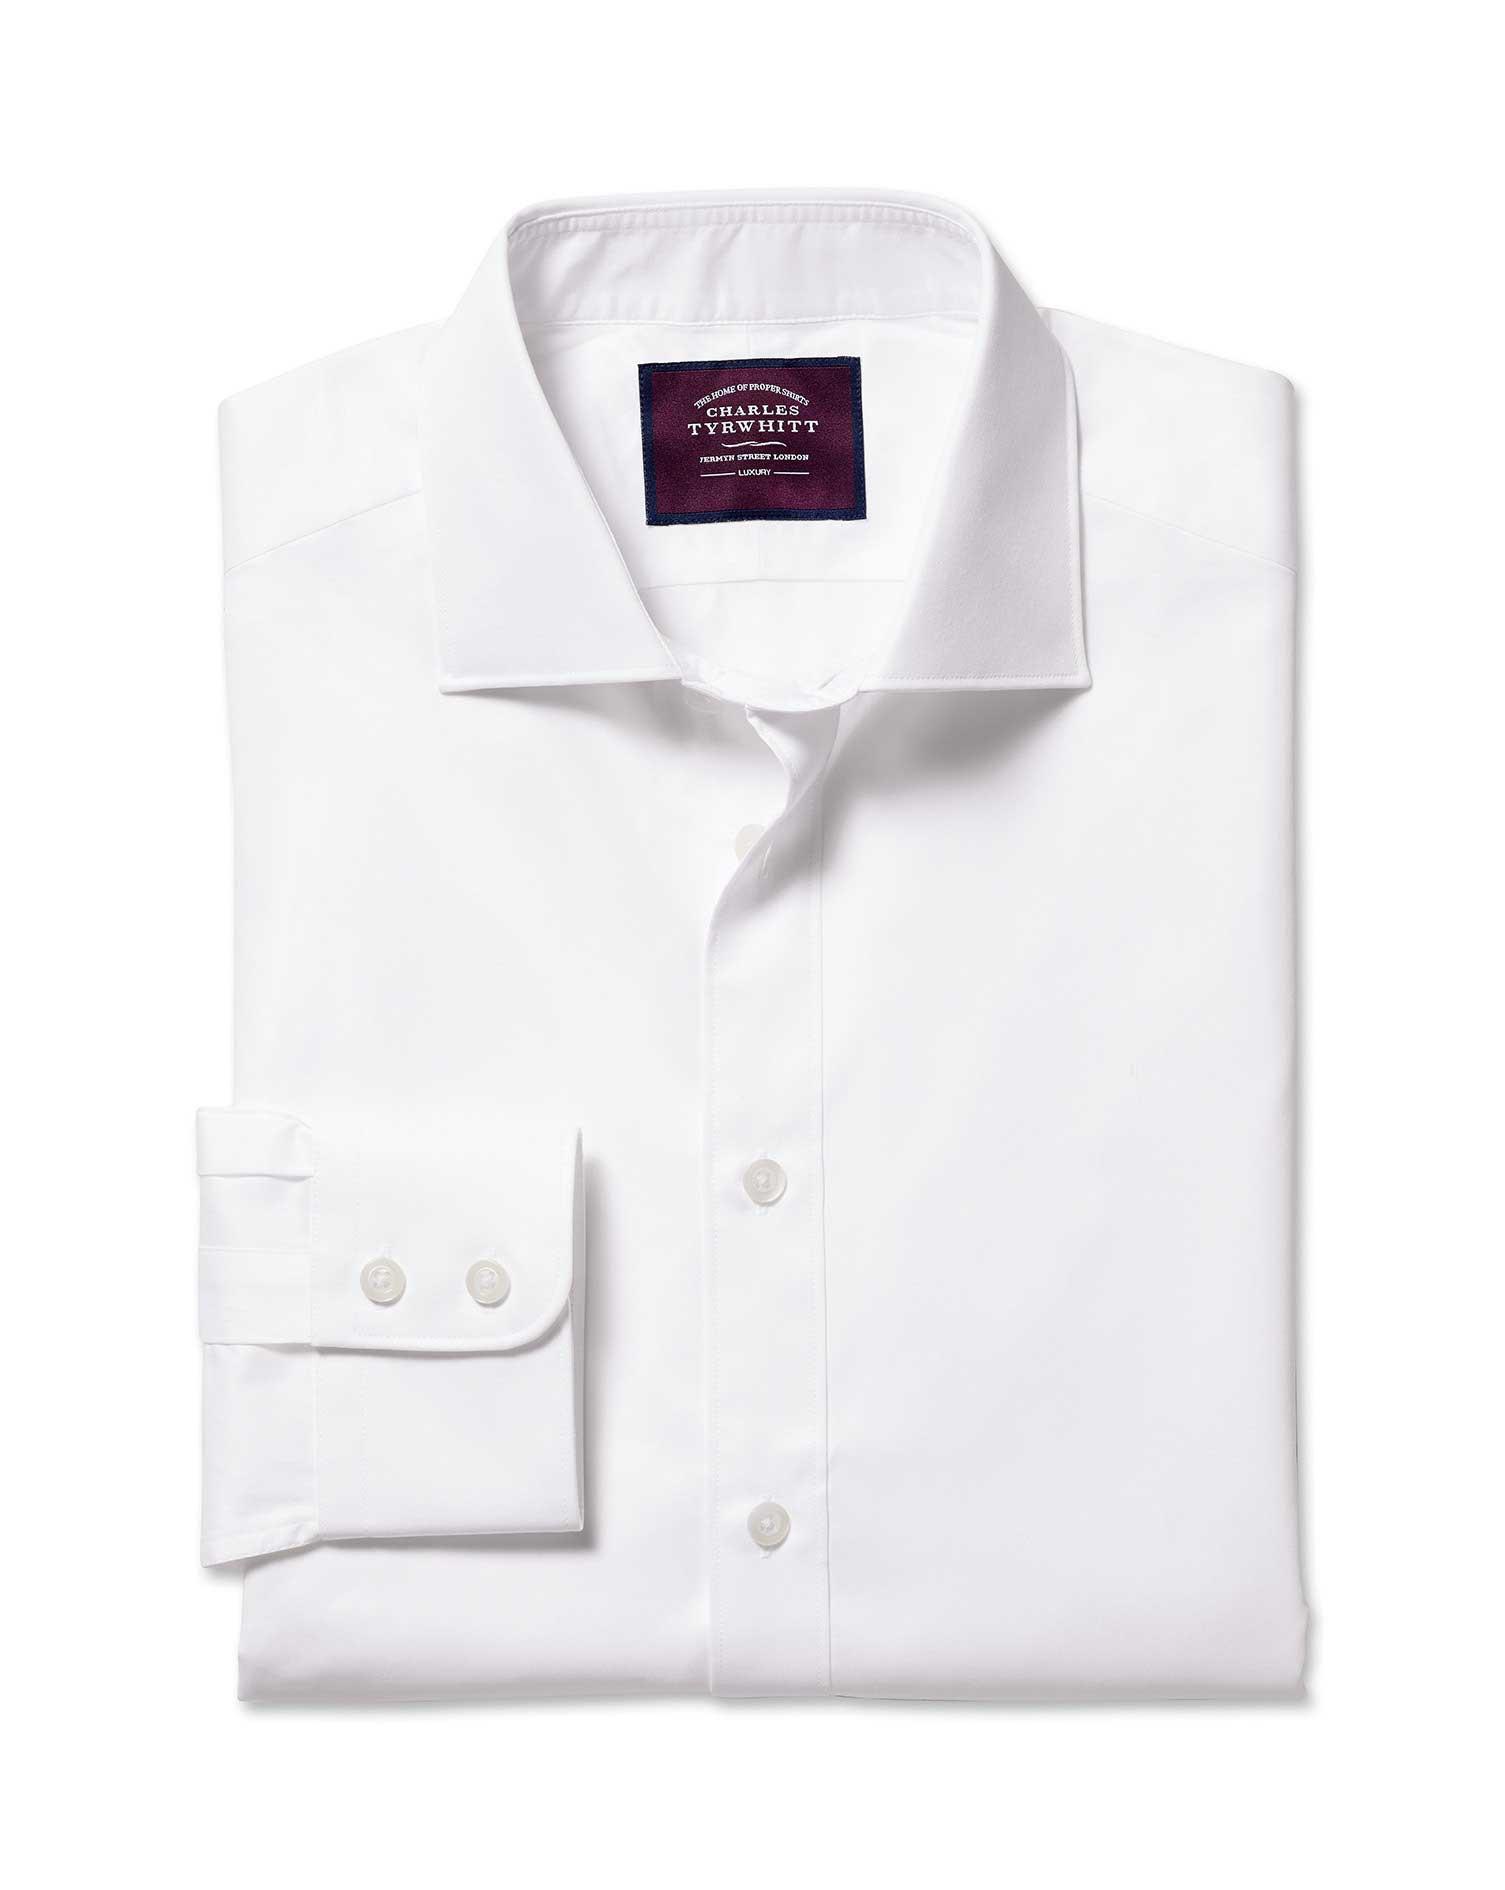 Extra Slim Fit Semi-Cutaway Luxury Twill White Egyptian Cotton Formal Shirt Double Cuff Size 16/38 b